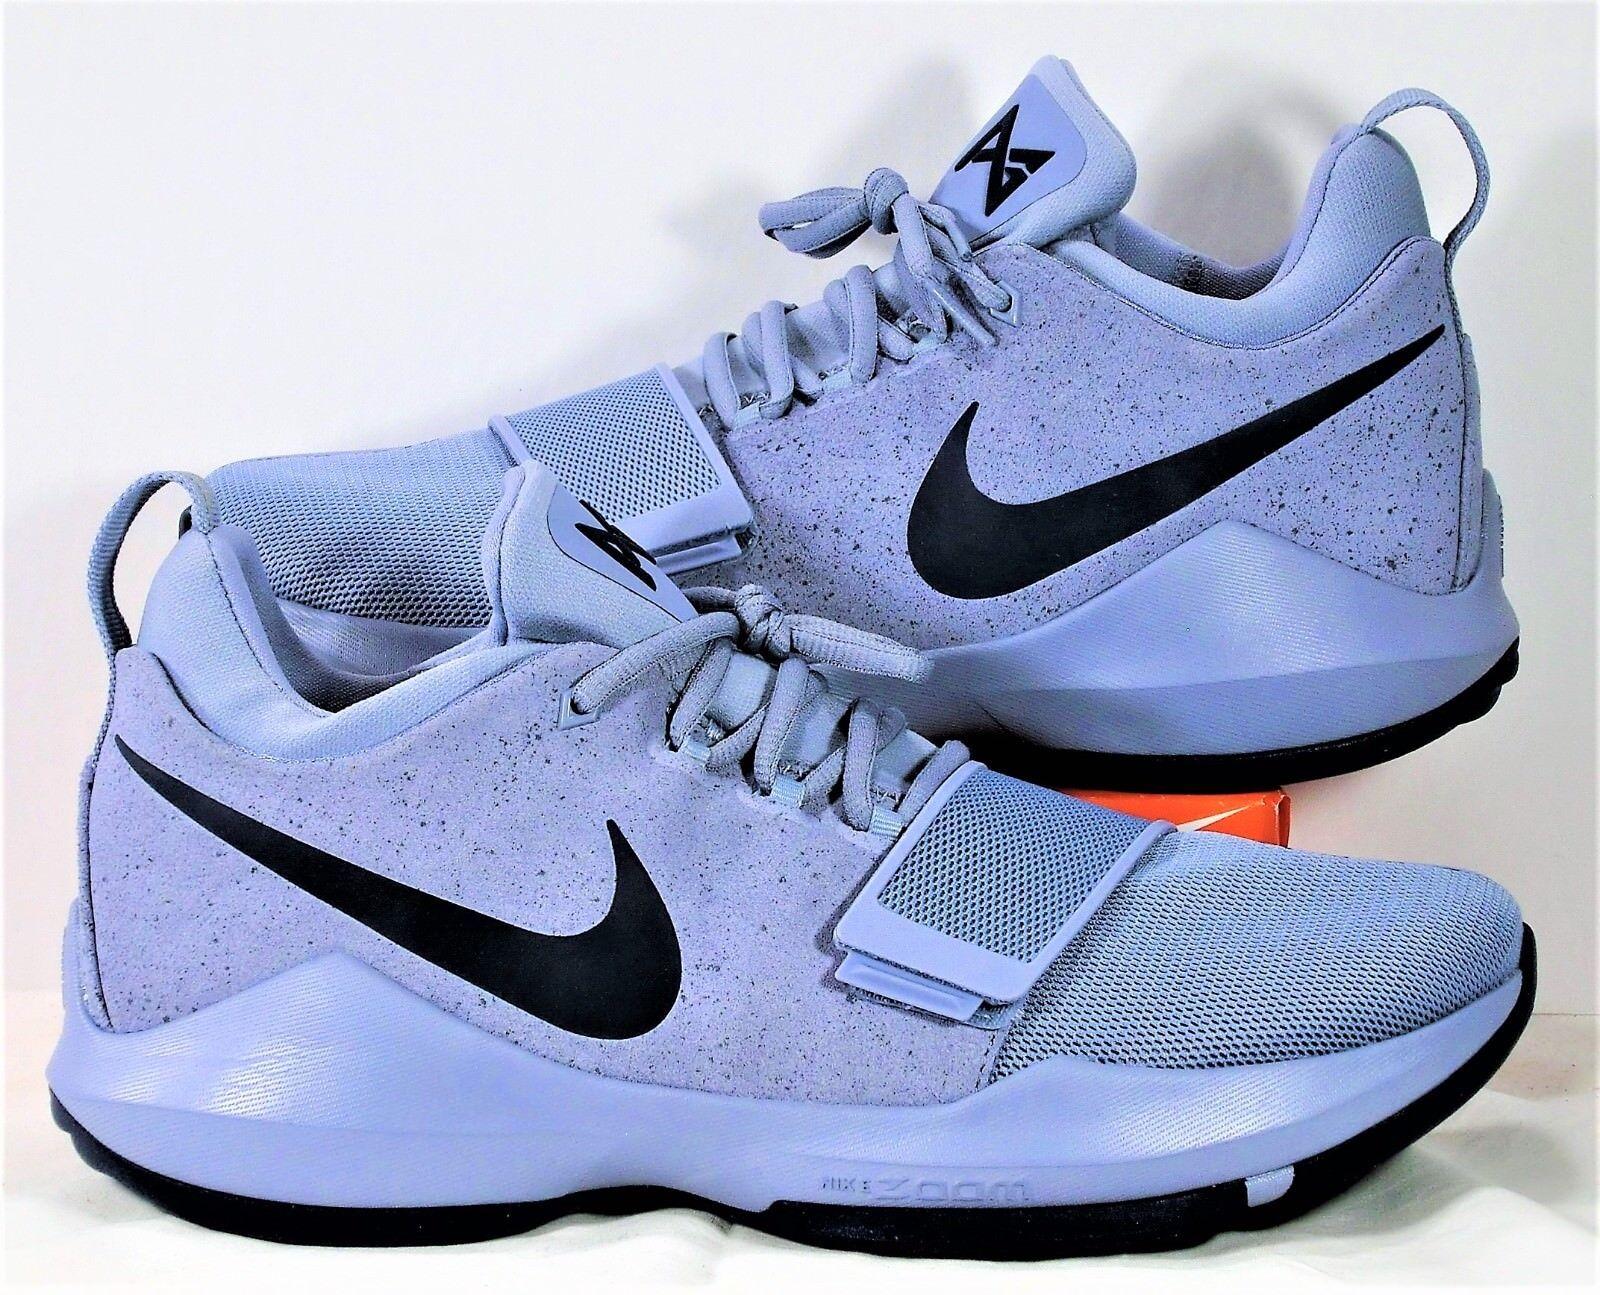 Nike Paul George PG 1 Grey & Midnight Navy Basketball shoes Sz 10 NEW 878627 044